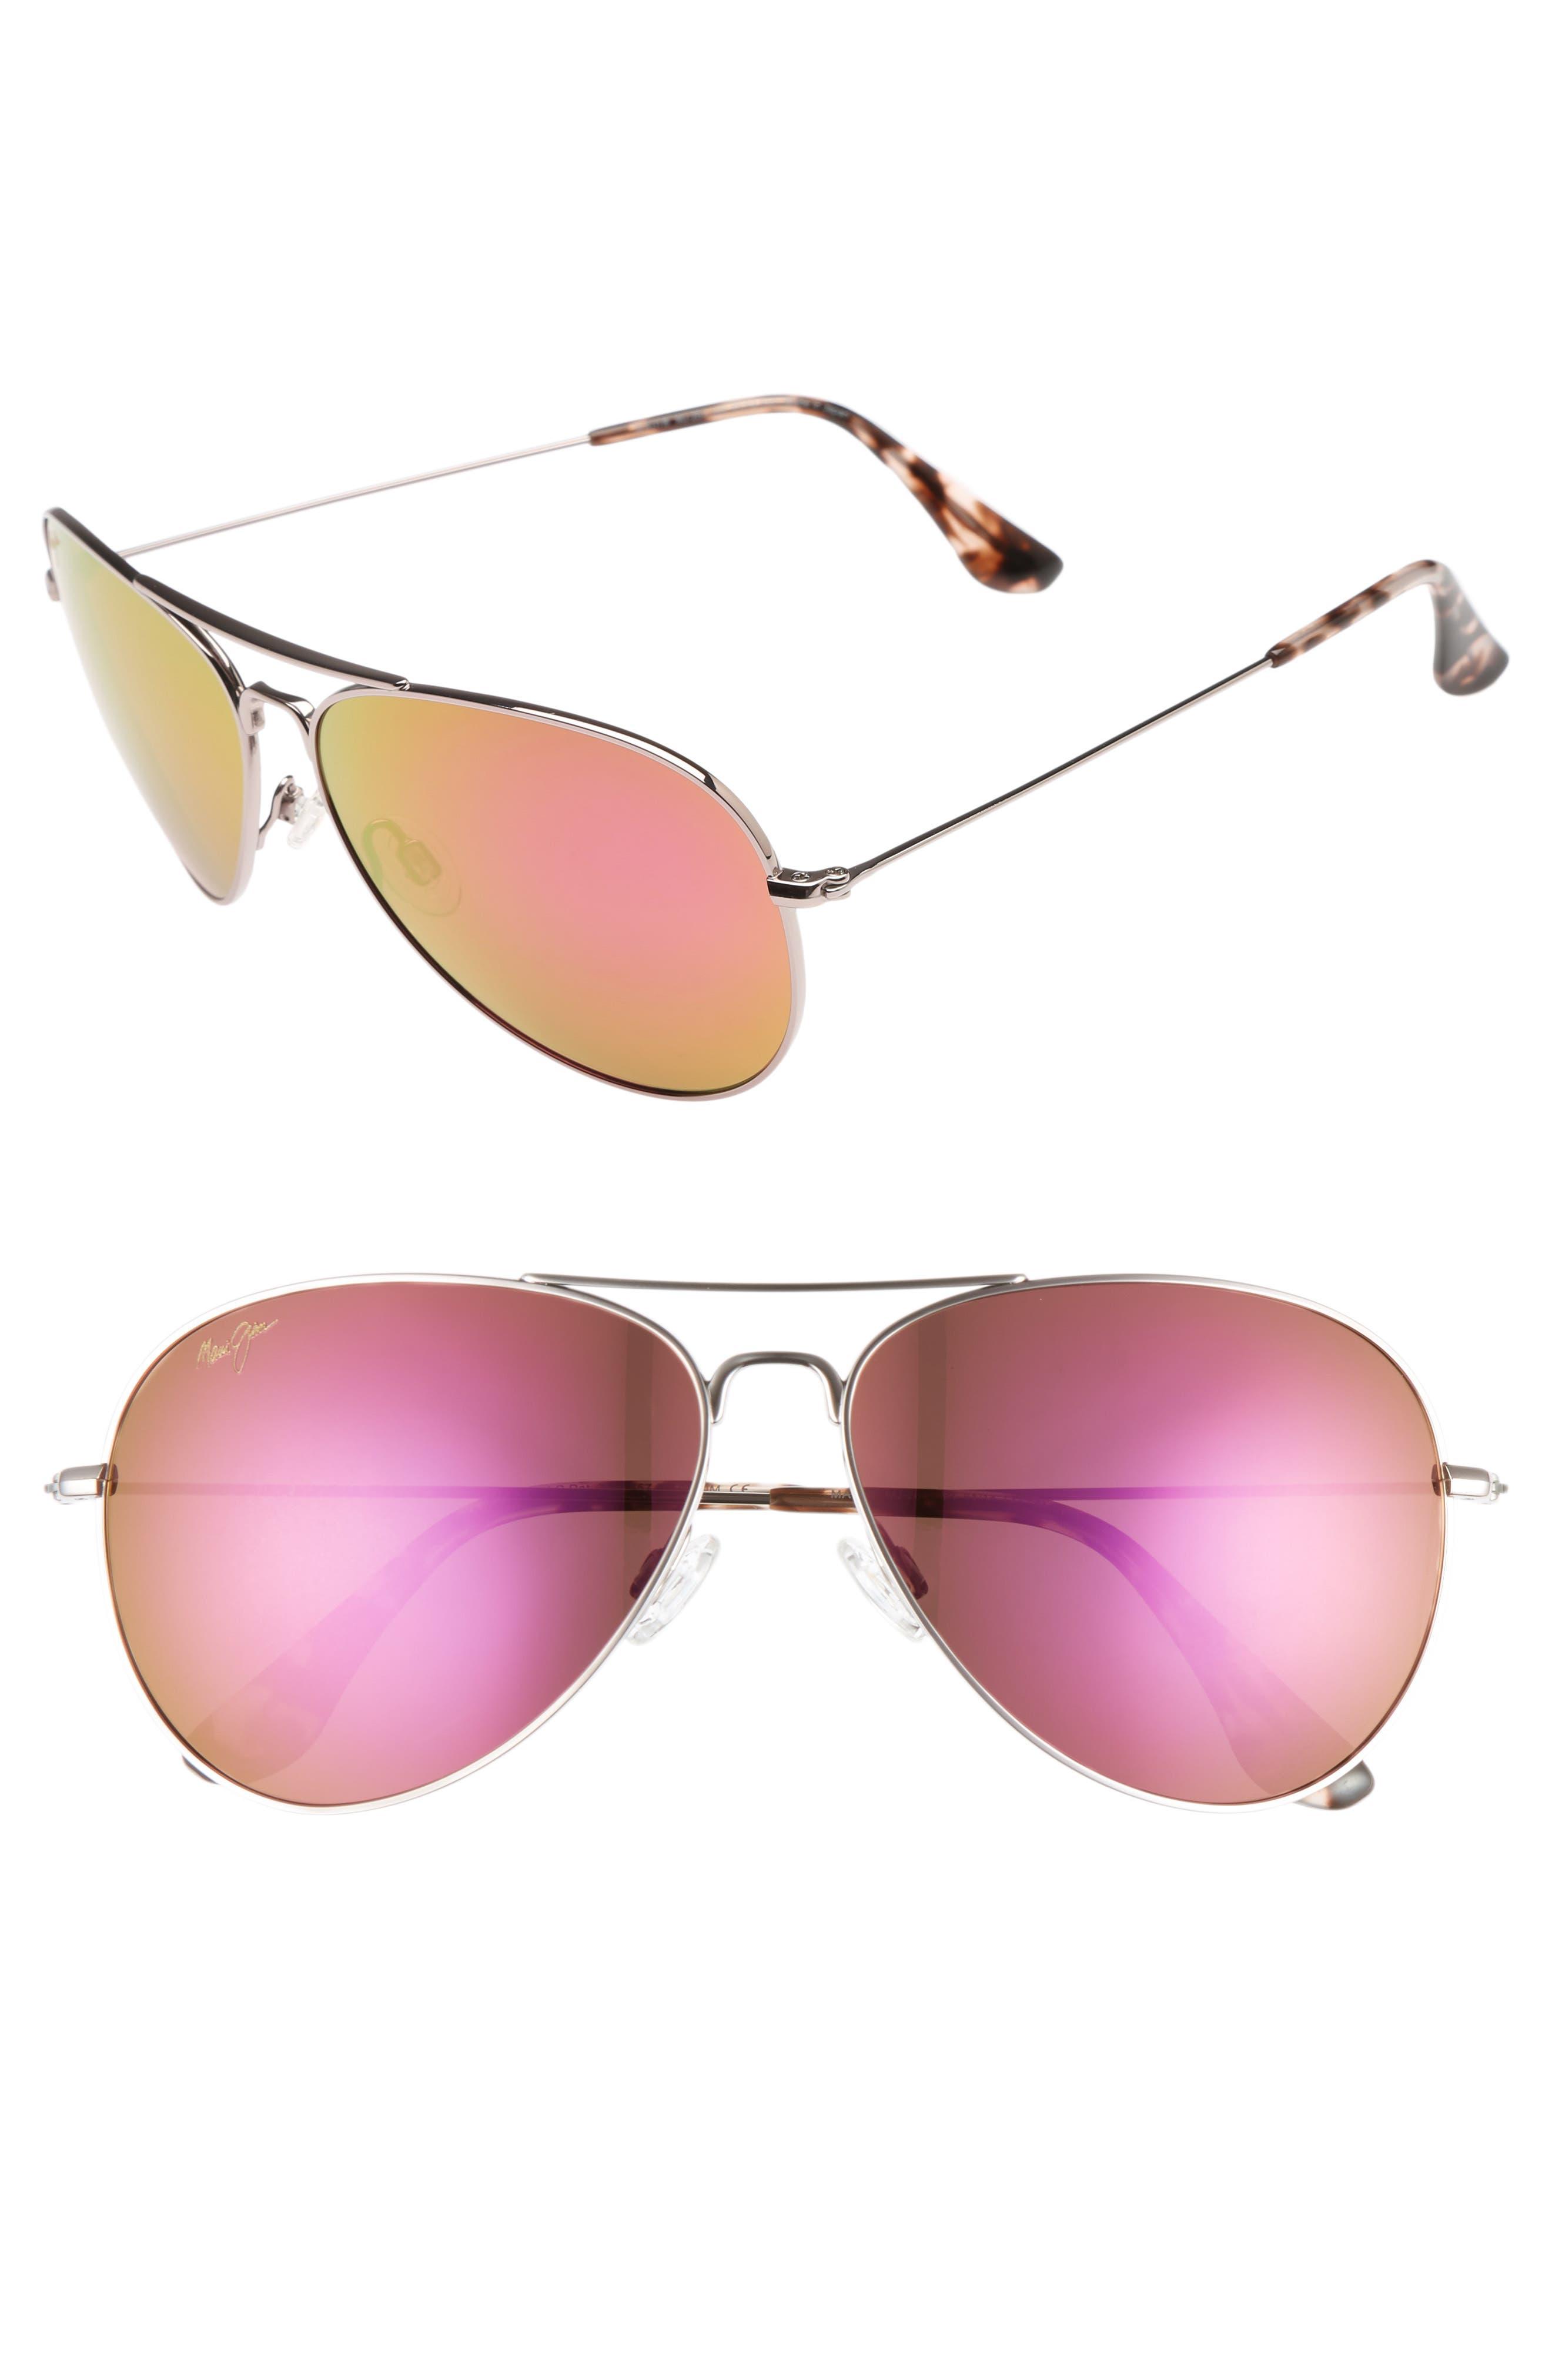 Mavericks 61mm PolarizedPlus2<sup>®</sup> Aviator Sunglasses,                             Main thumbnail 1, color,                             ROSE GOLD/ MAUI SUNRISE